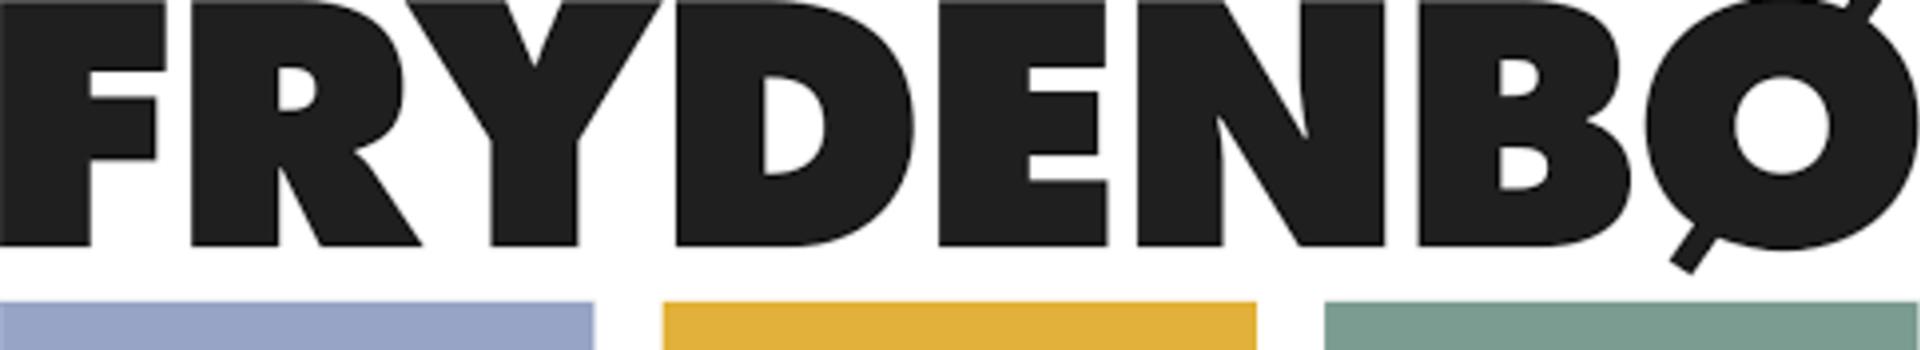 Frydenbø Industri Bergen søker Teamleder motormekanikere